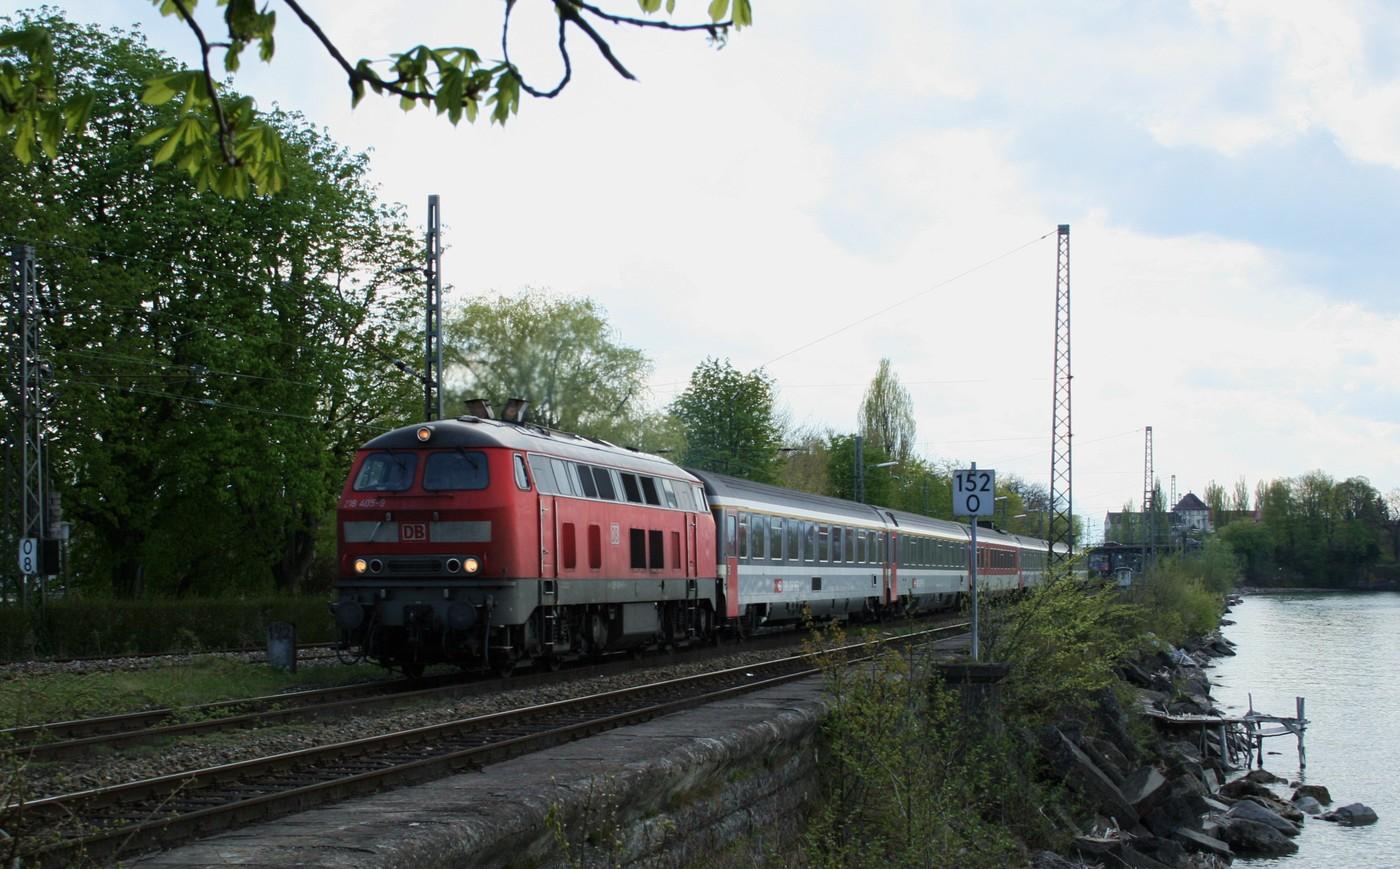 http://www.eisenbahn-im-bild.de/Temp/C_09_Lind_IMG_3486.jpg